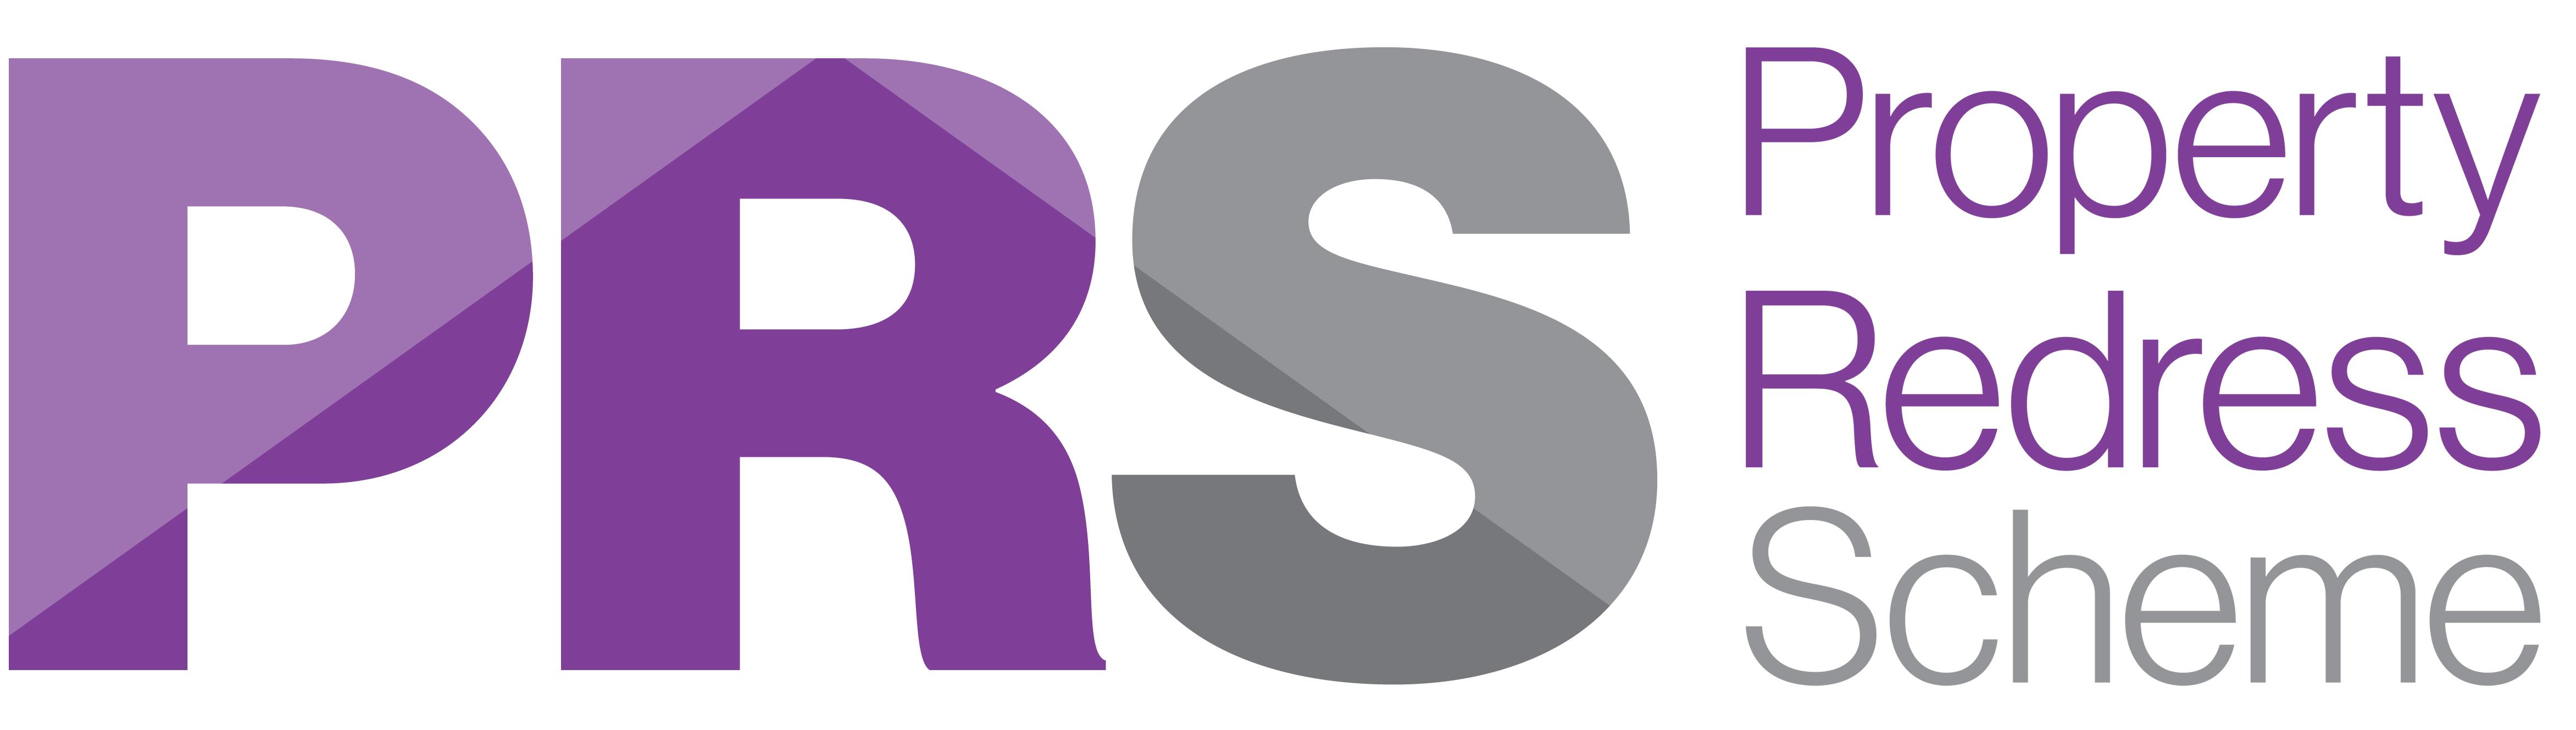 Property Redress Scheme Central Housing Group